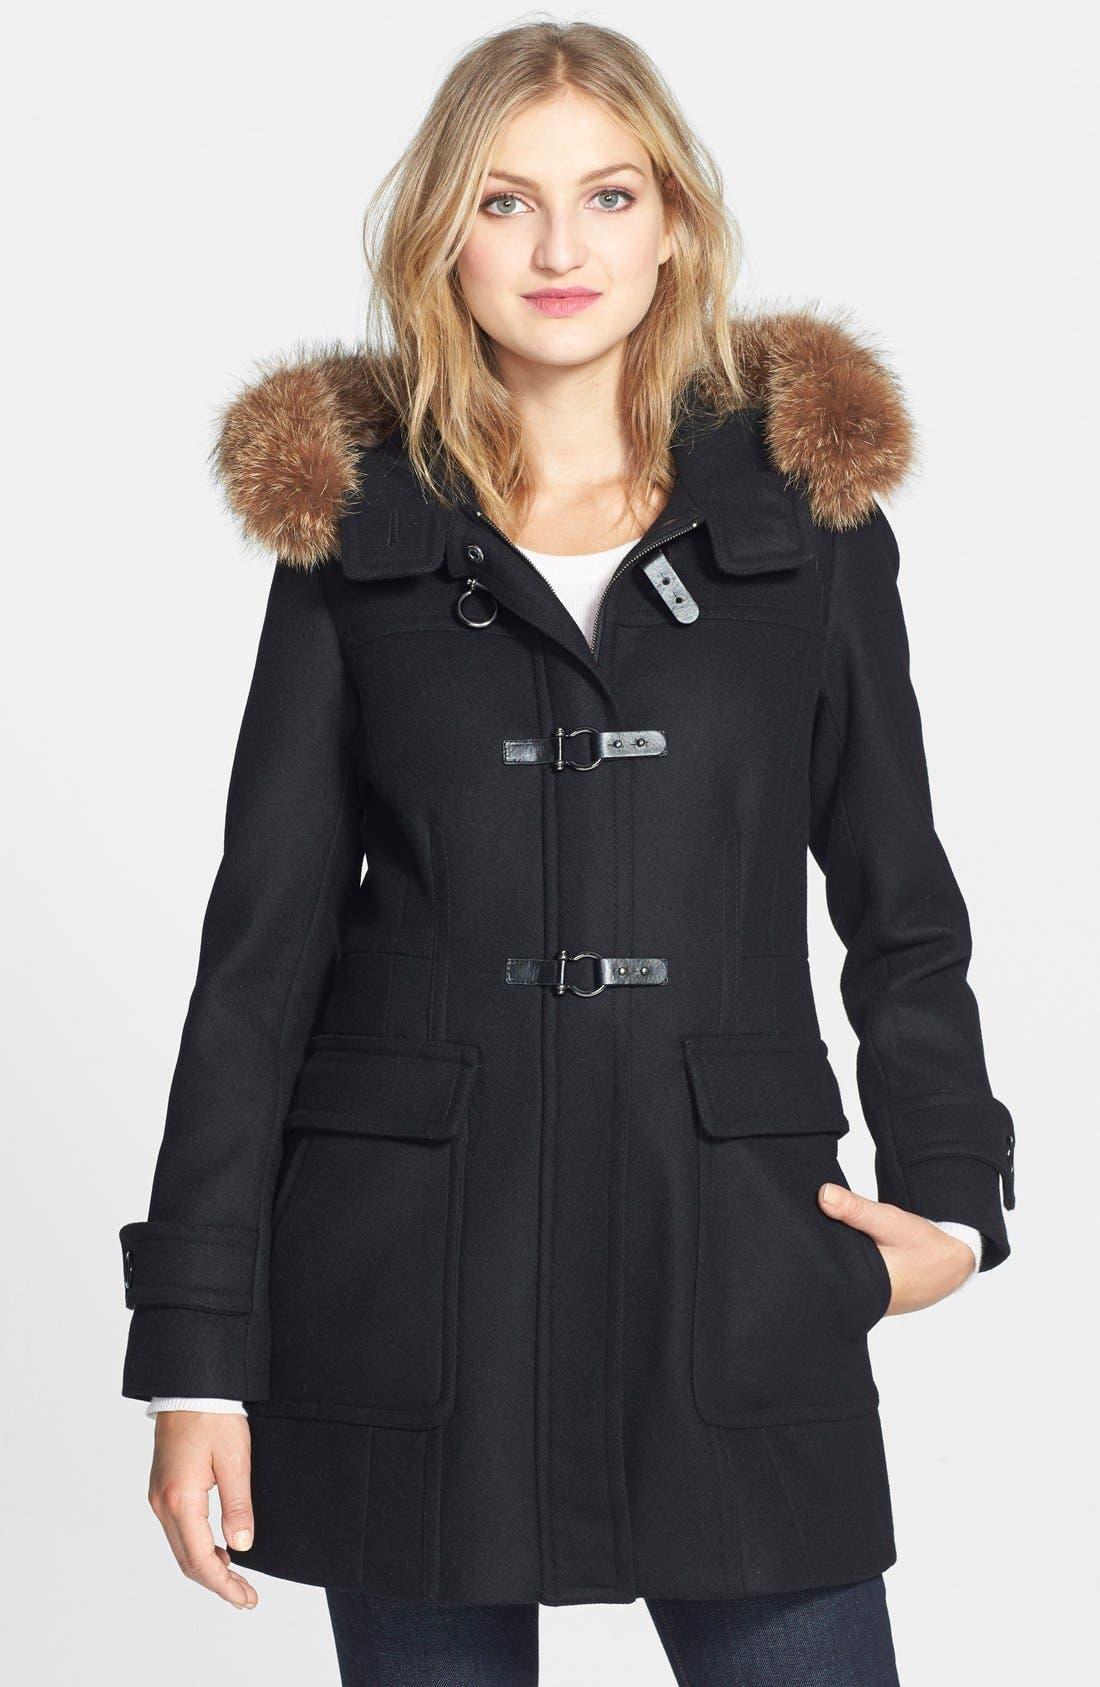 Alternate Image 1 Selected - Trina Turk Genuine Coyote Fur Trim Wool Blend Duffle Coat